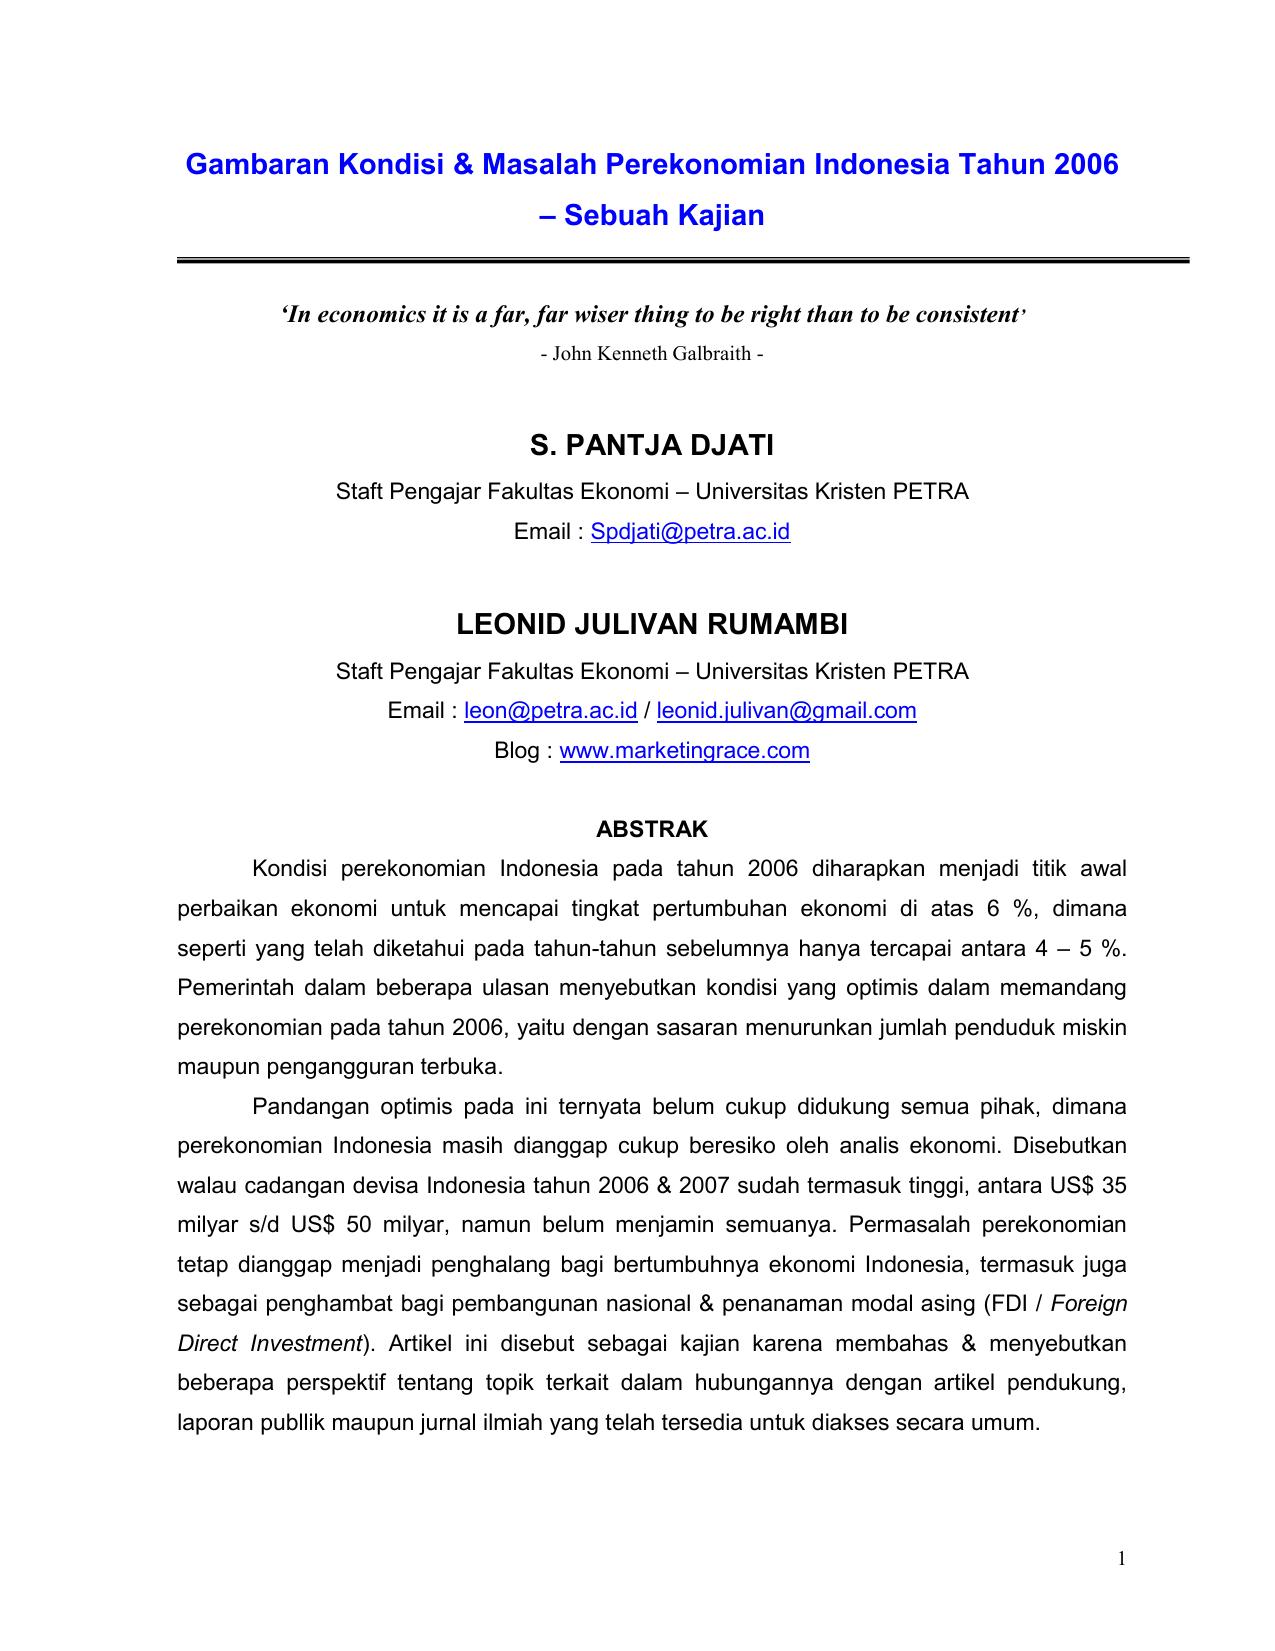 Masalah Dalam Ekonomi Indonesia Faculty E